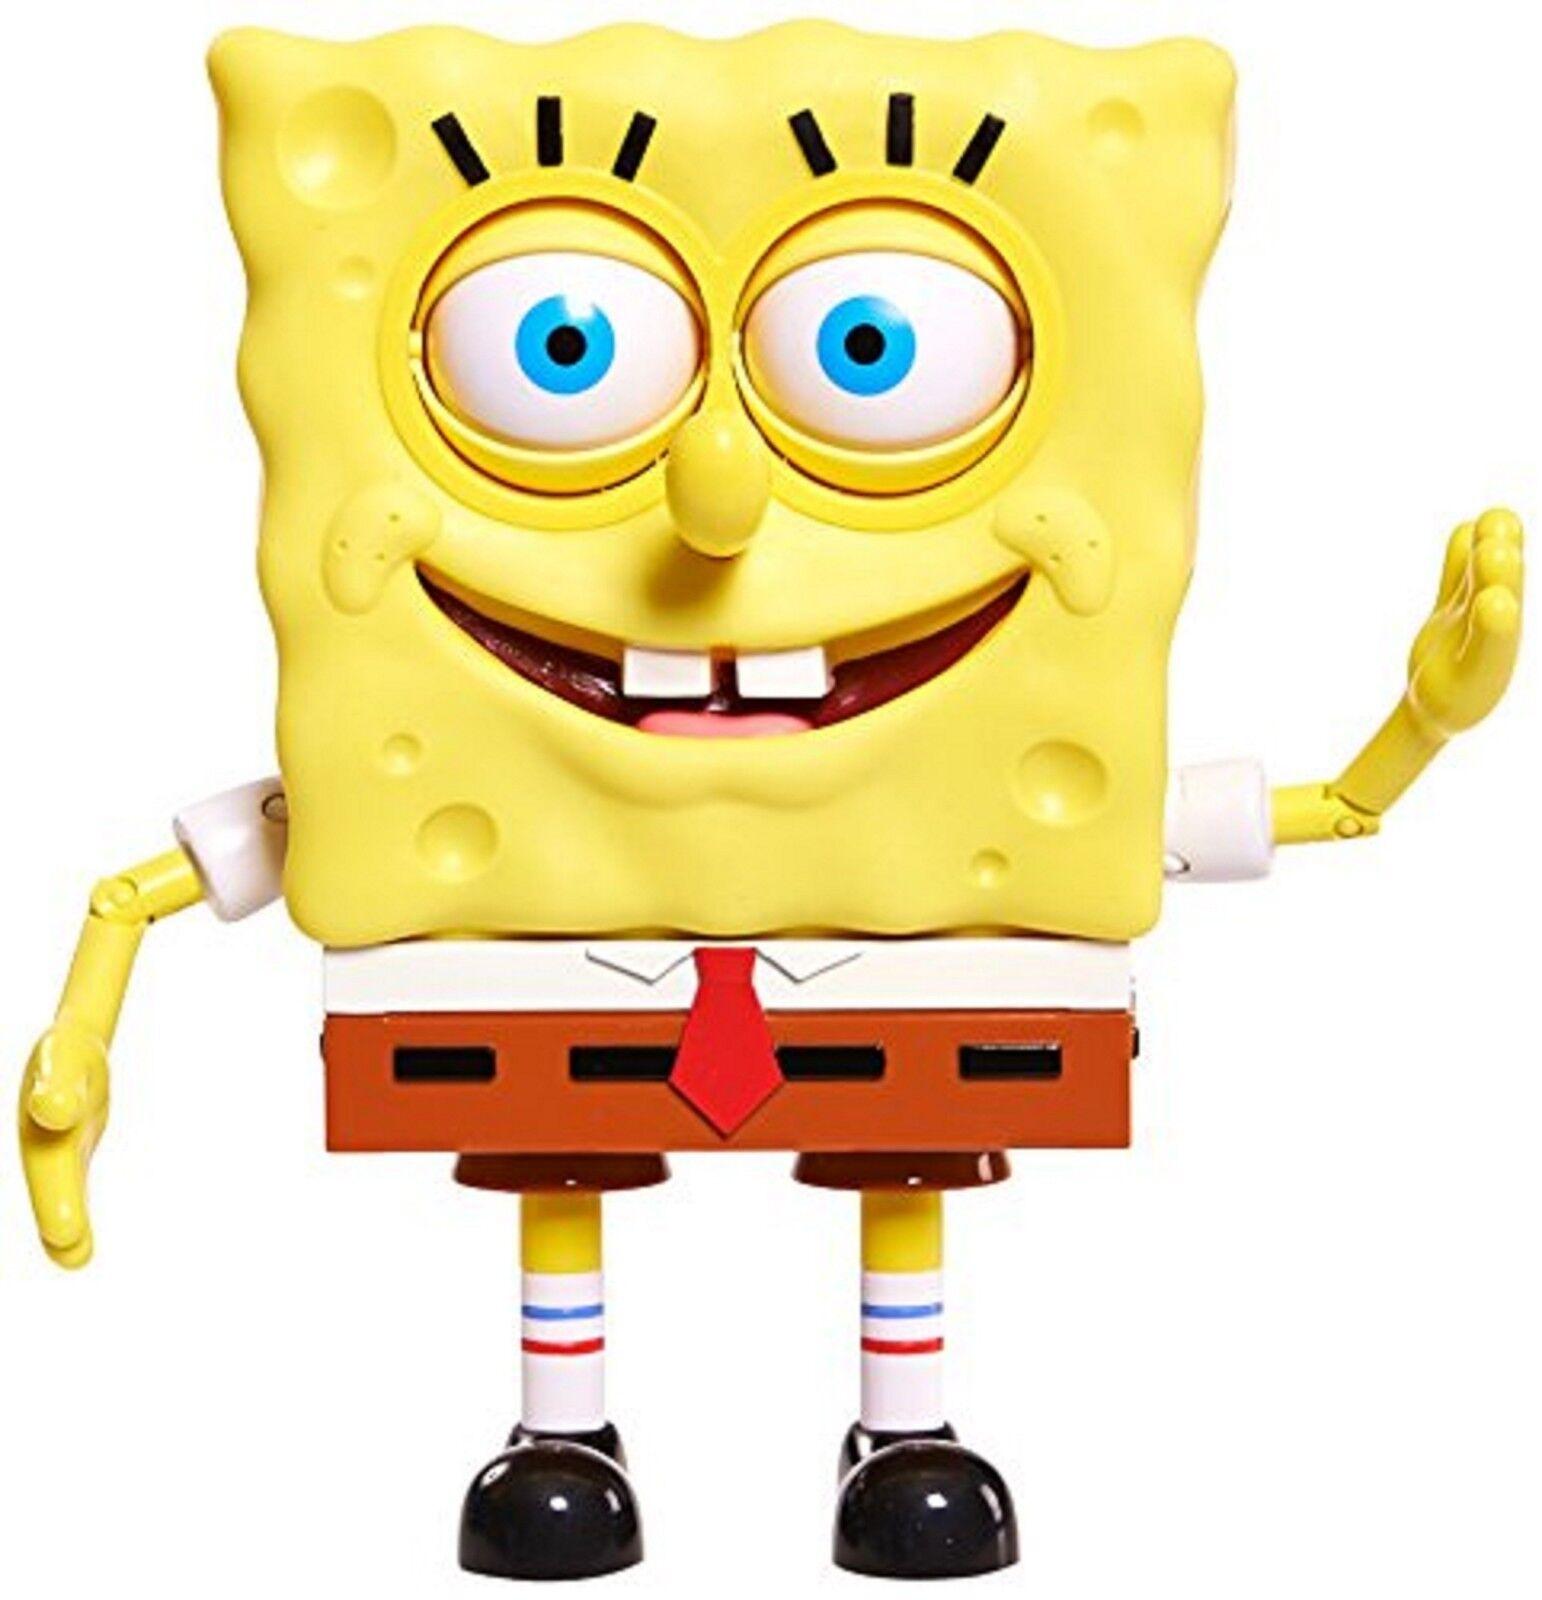 Spongebob spongebuddy mit superhirn squrepants puppe alter 3 + neues spielzeug